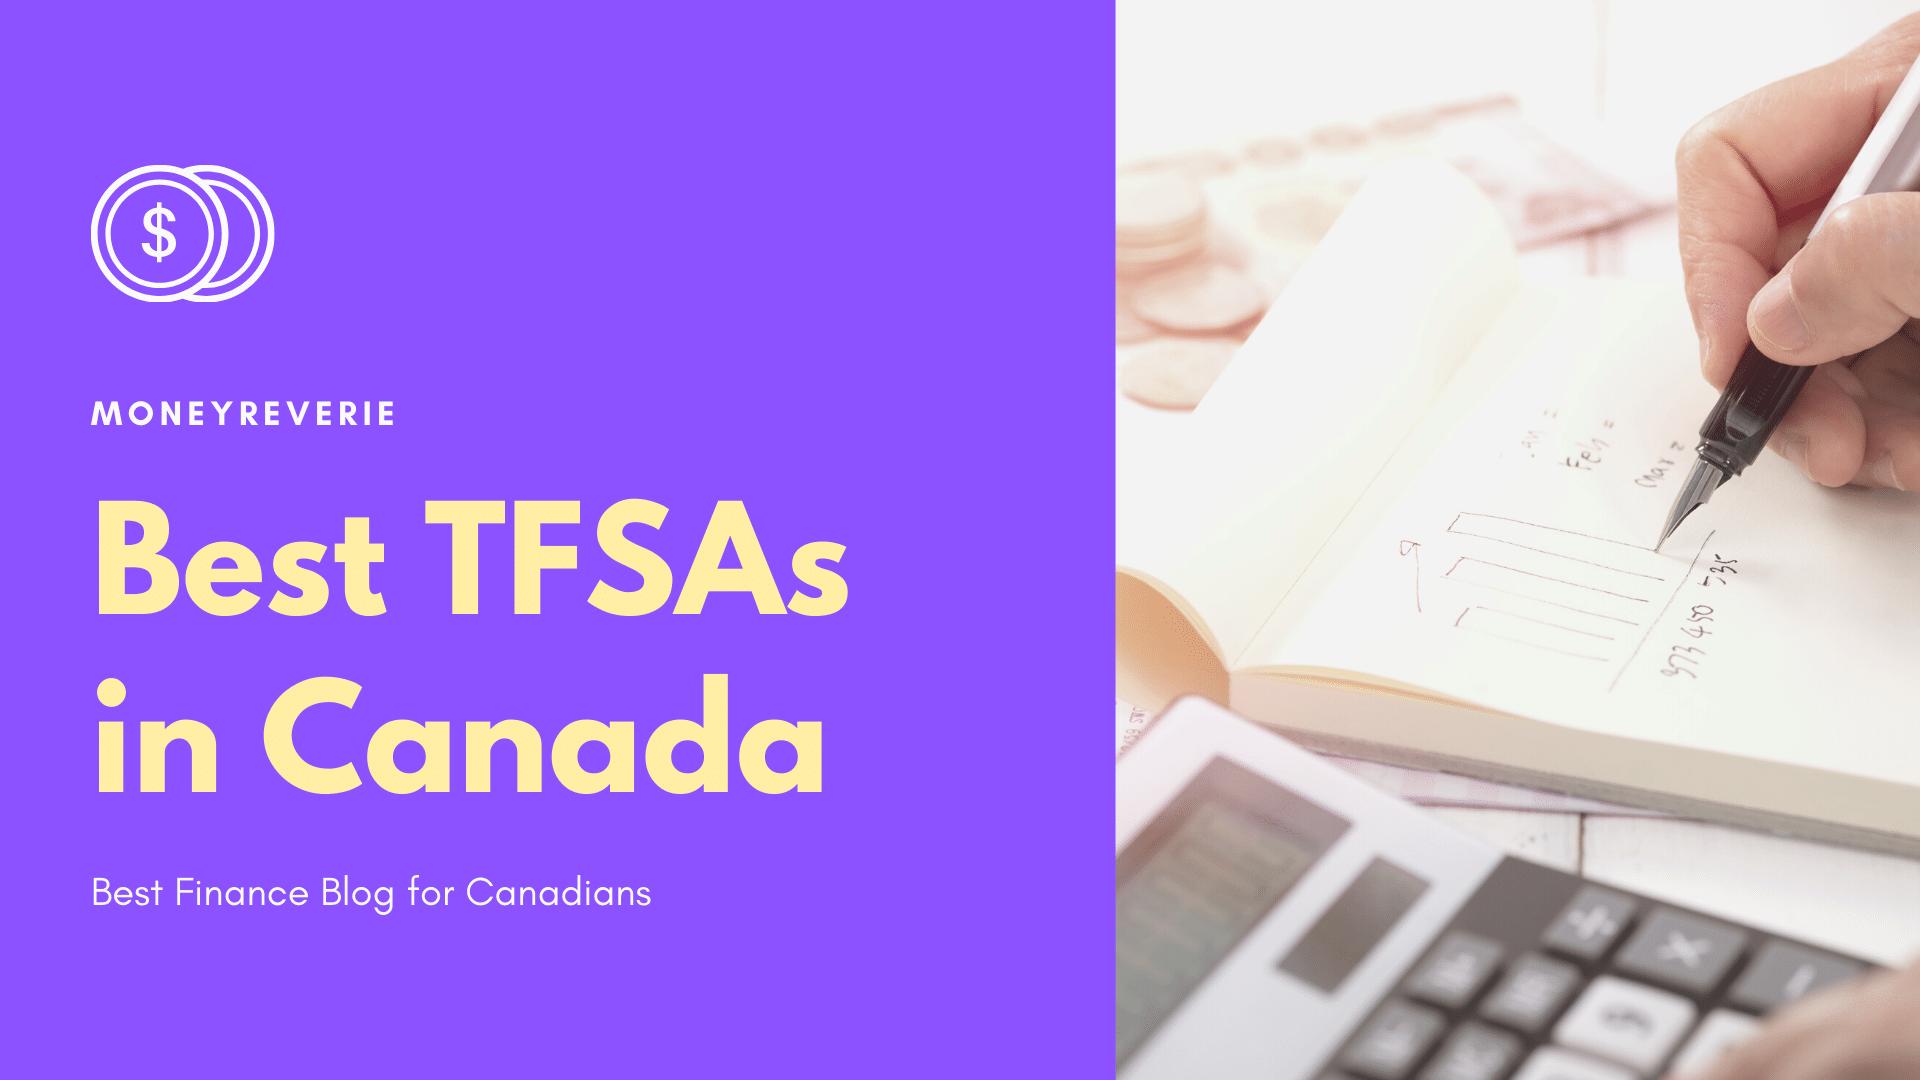 Best TFSAs in Canada